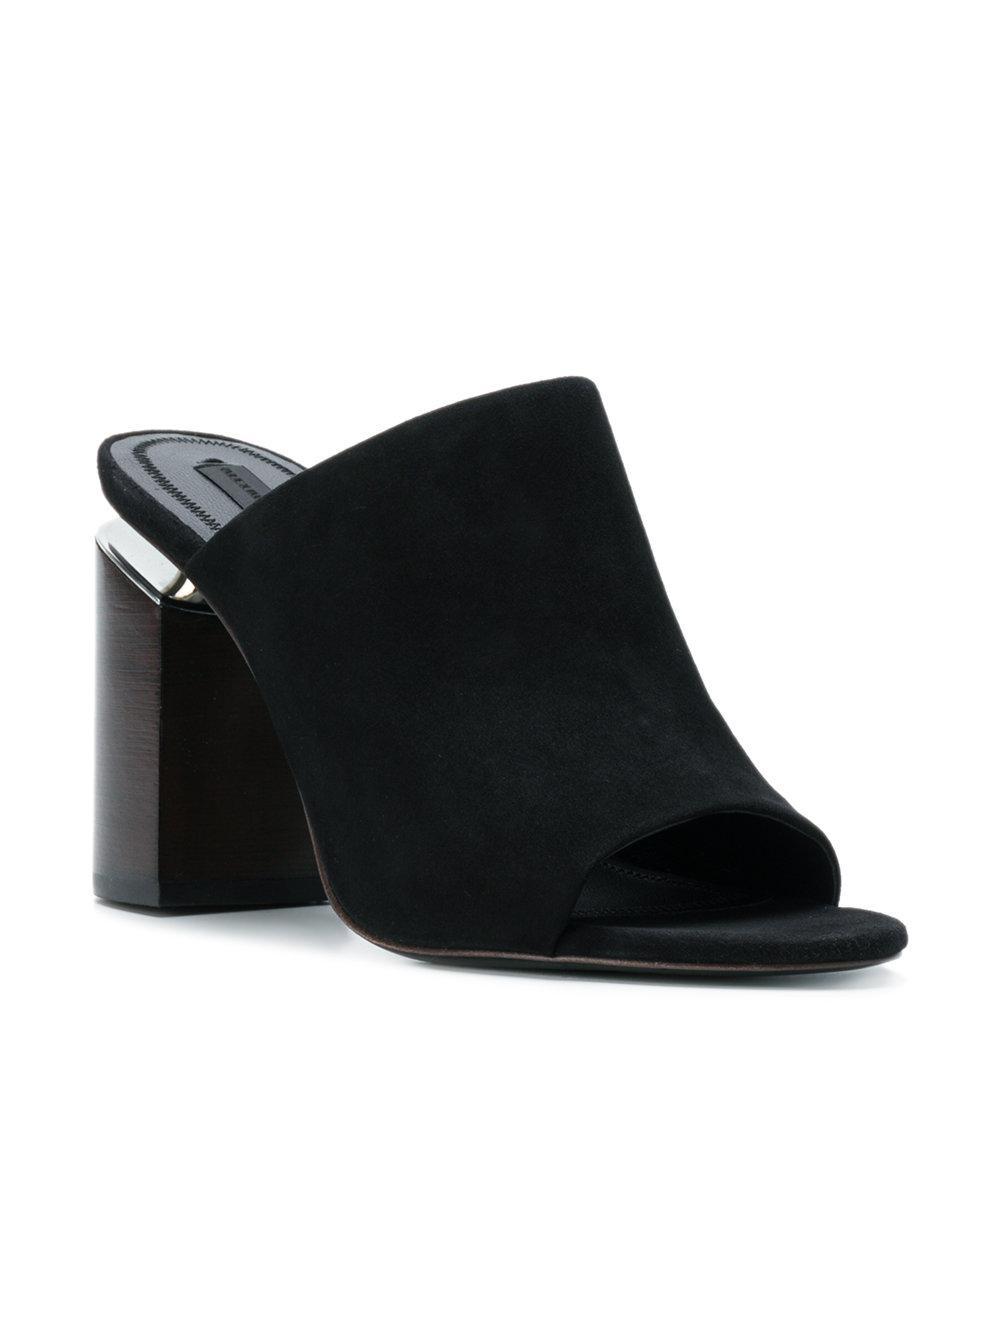 bce5e8a1afa Lyst - Alexander Wang Avery Black Suede Block Heel Mules in Black - Save  47.36842105263158%